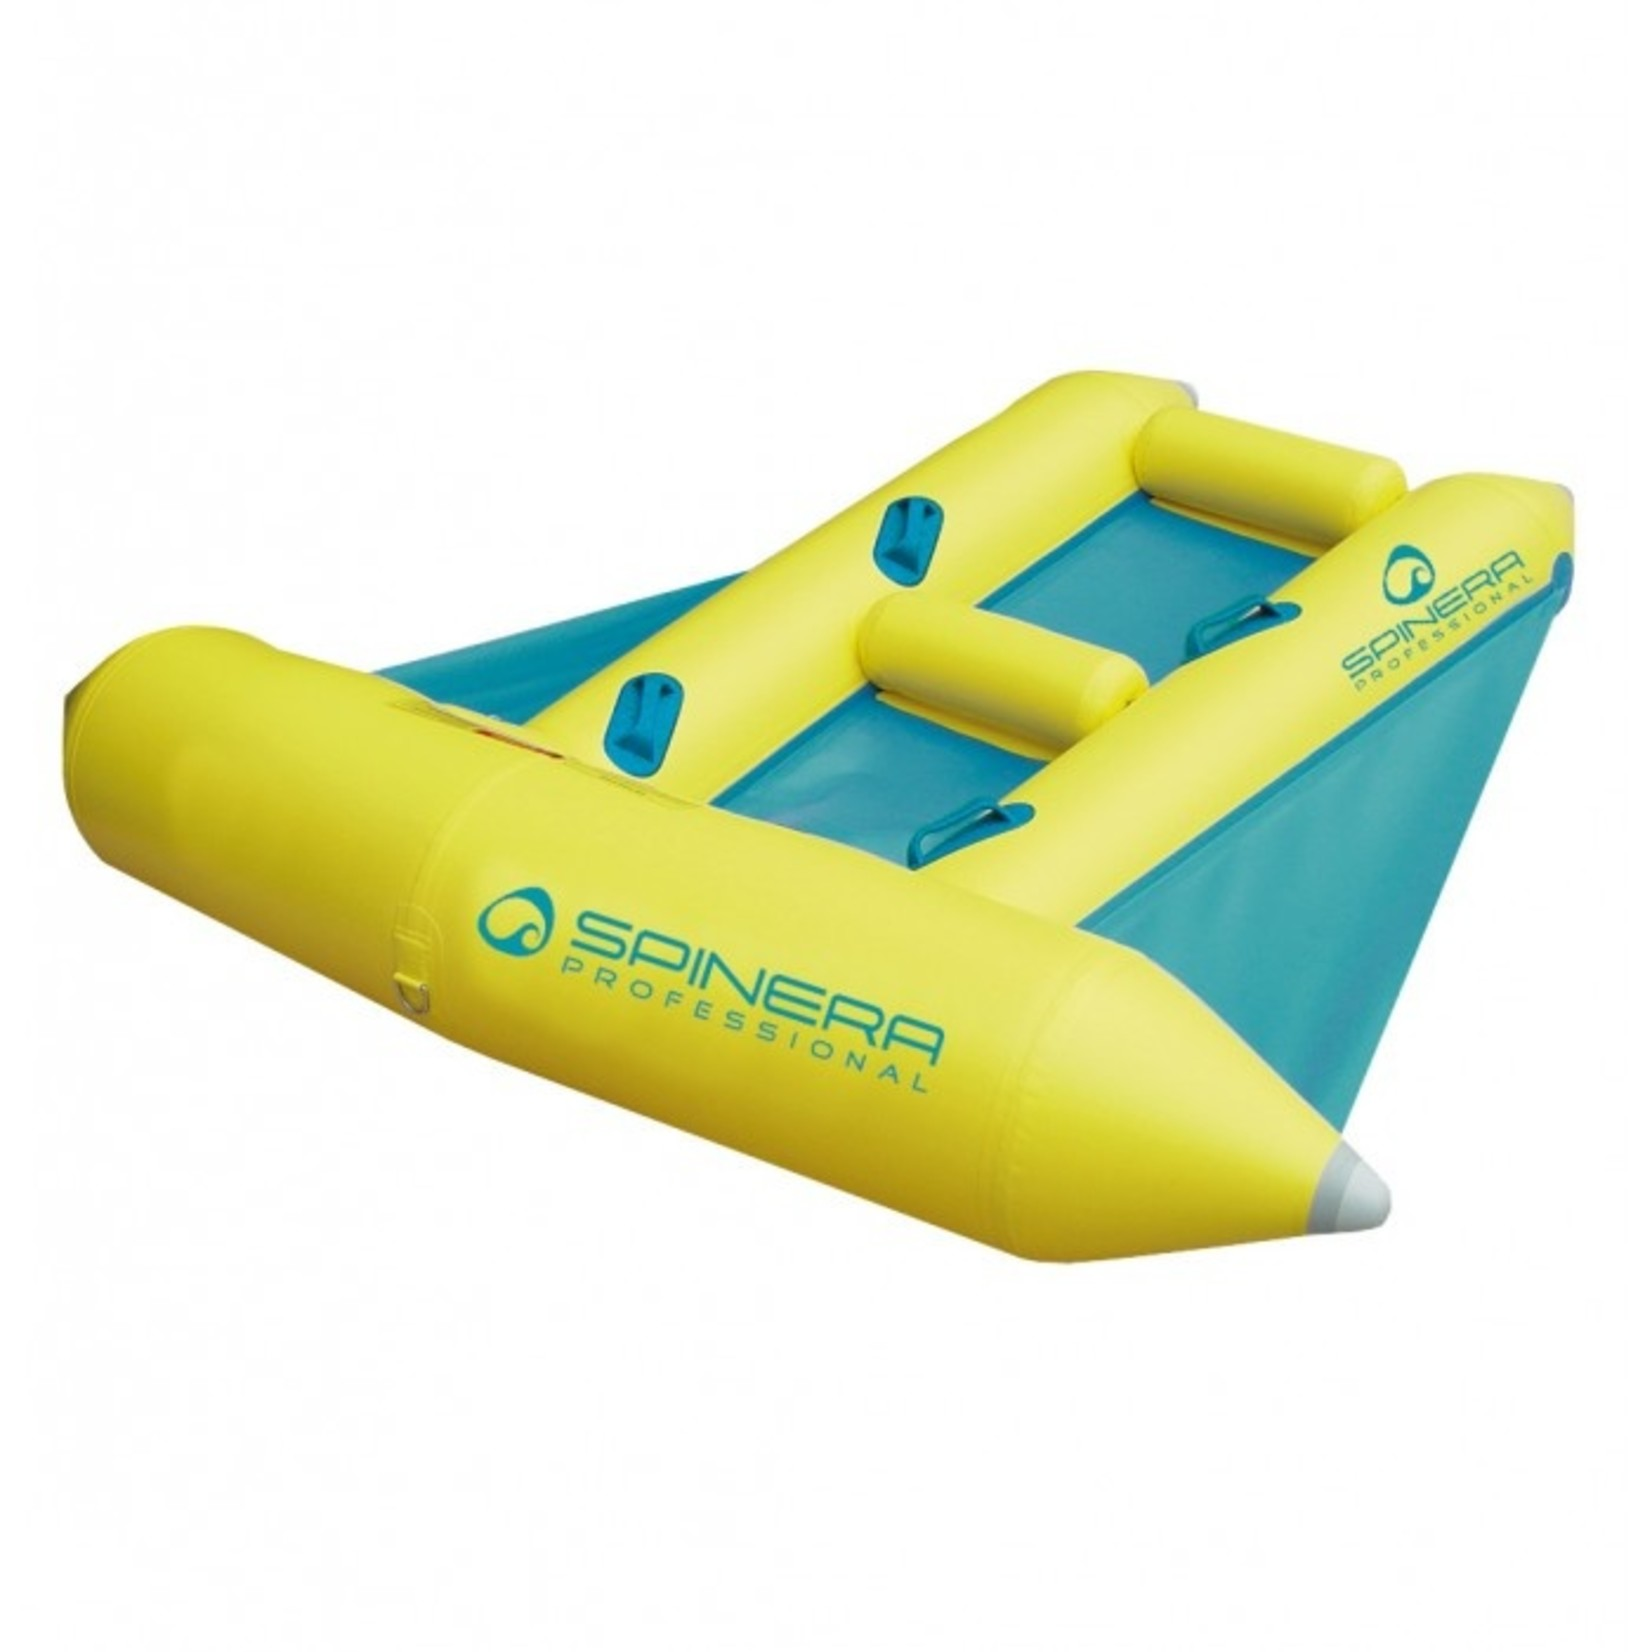 Spinera Professional Water Glider 2 - Flying banana